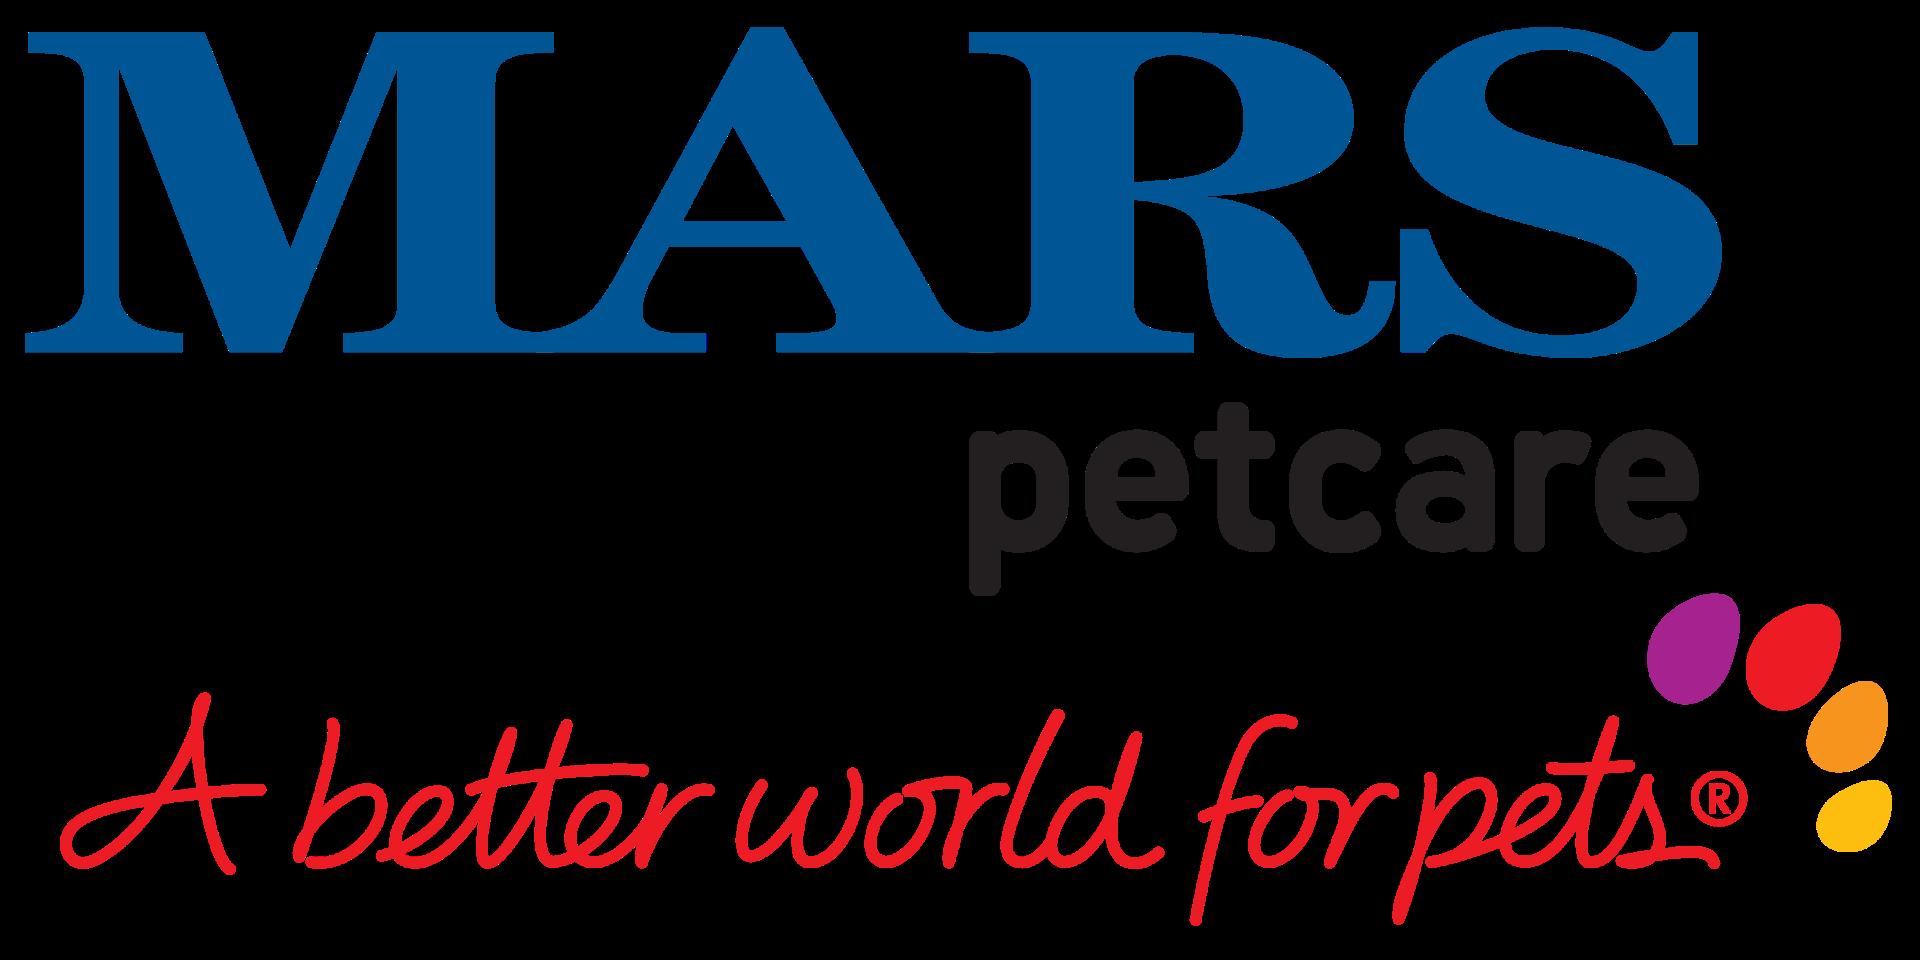 Mars Pet Care Logo